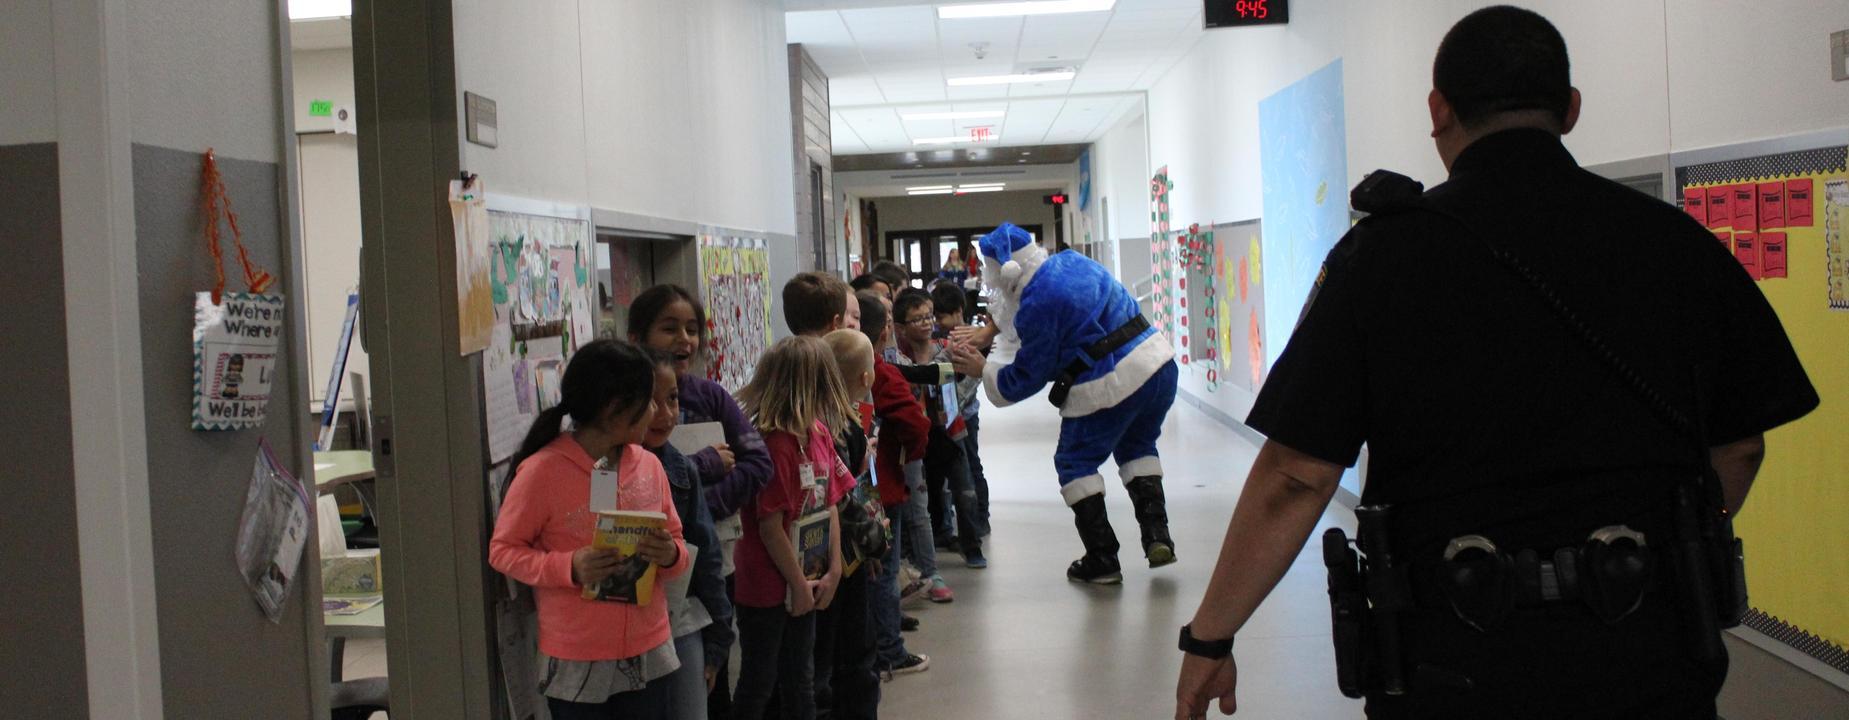 Elementary with Blue Santa